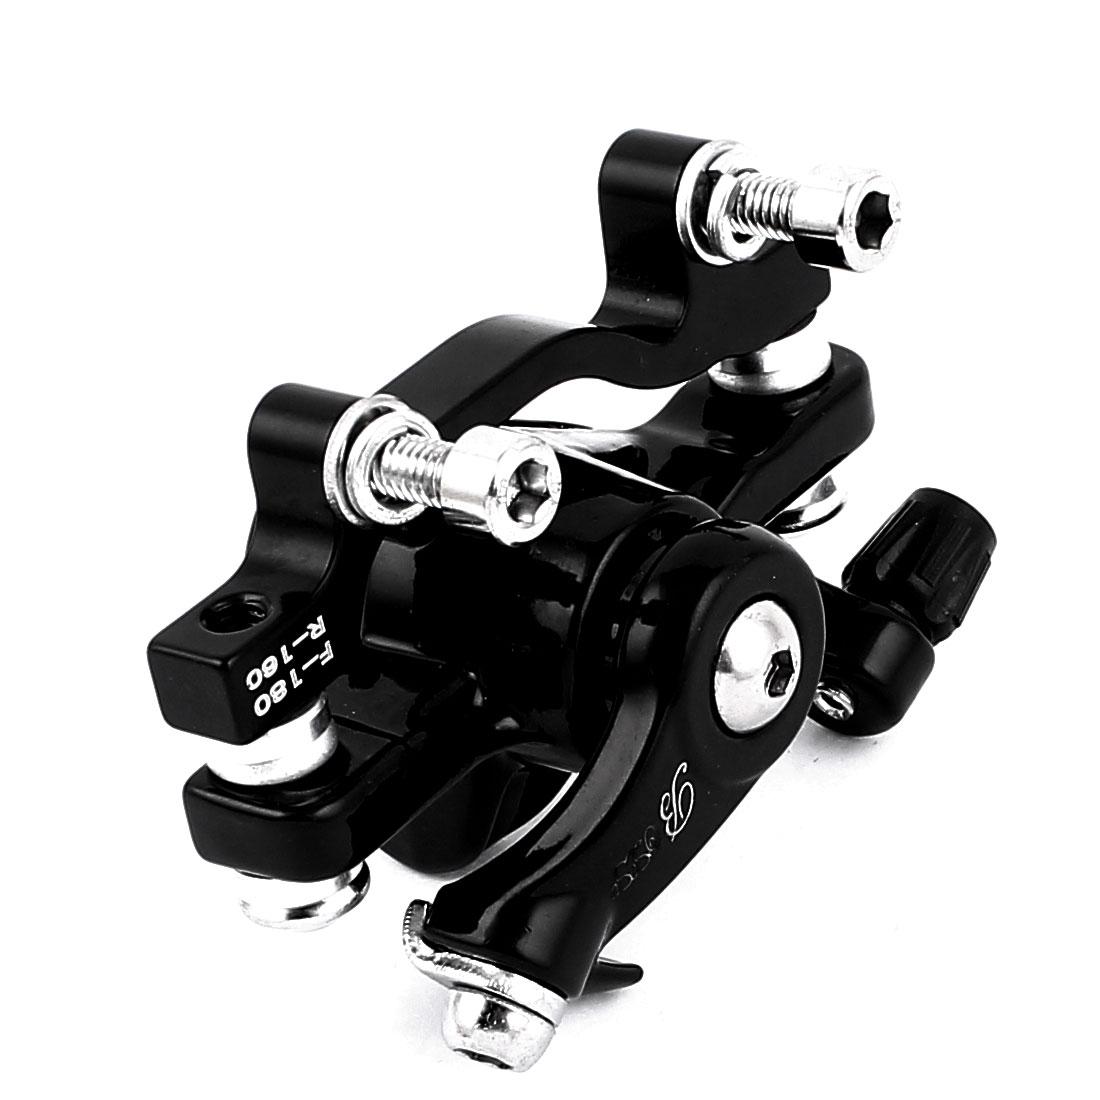 Mountain Bicycle Bike Mechanical Rear Disc Brake Caliper Black